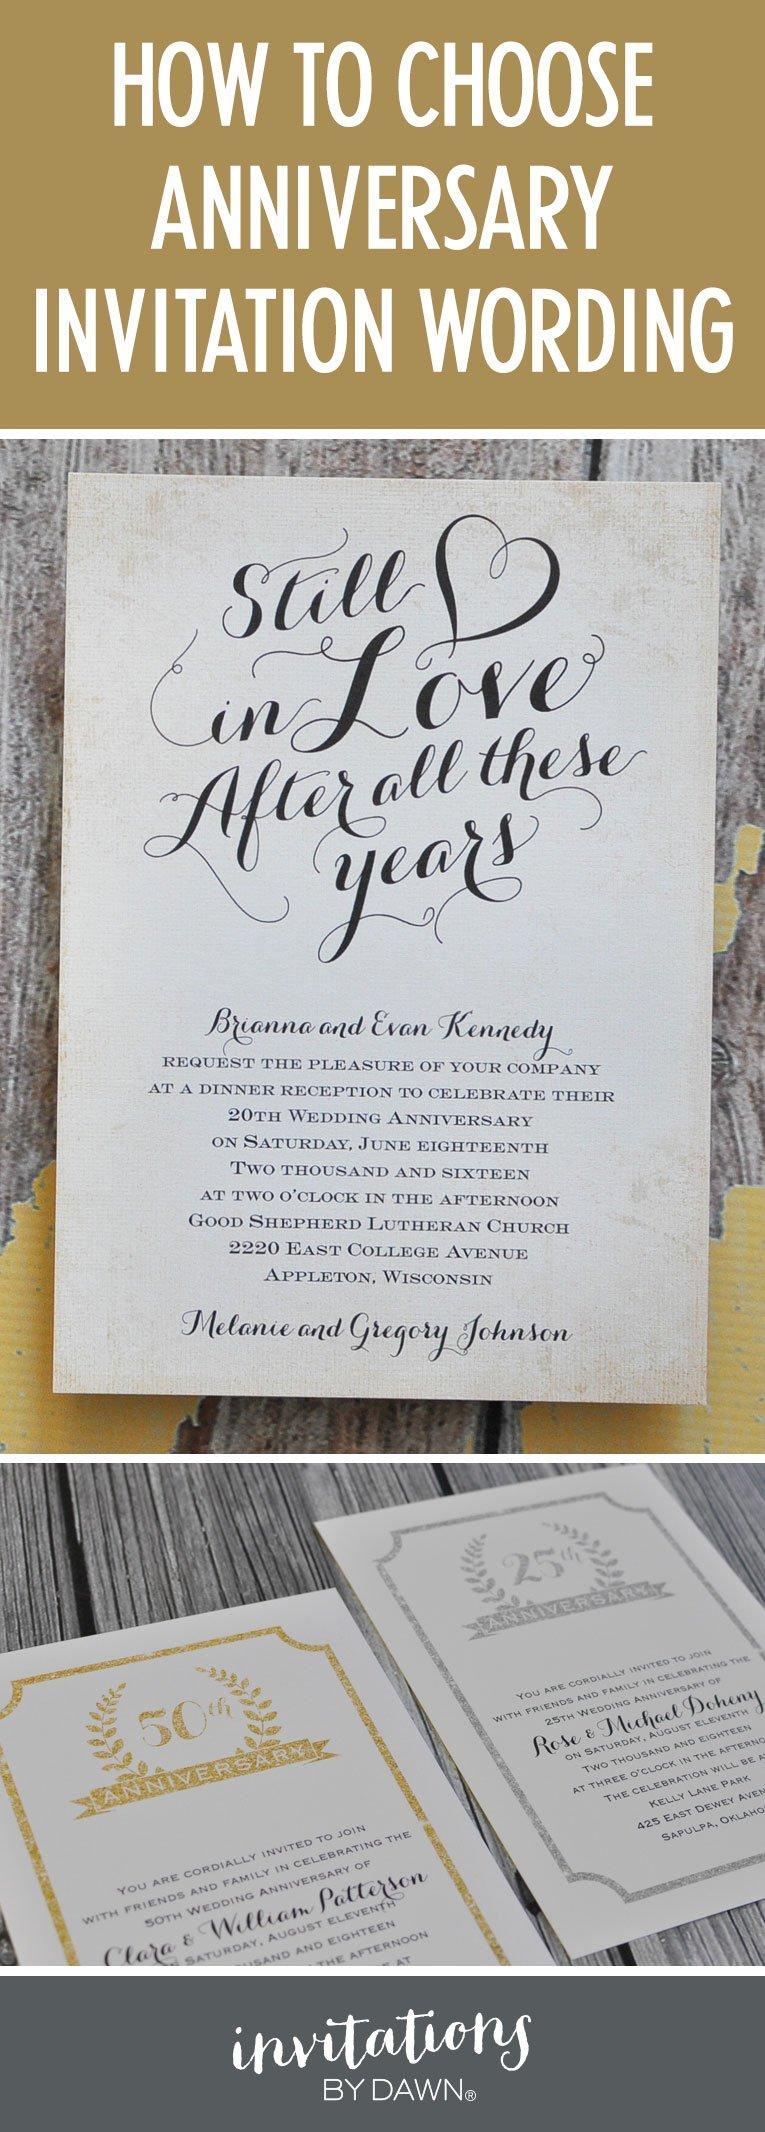 Couple Inviting Wedding Invitation Wording